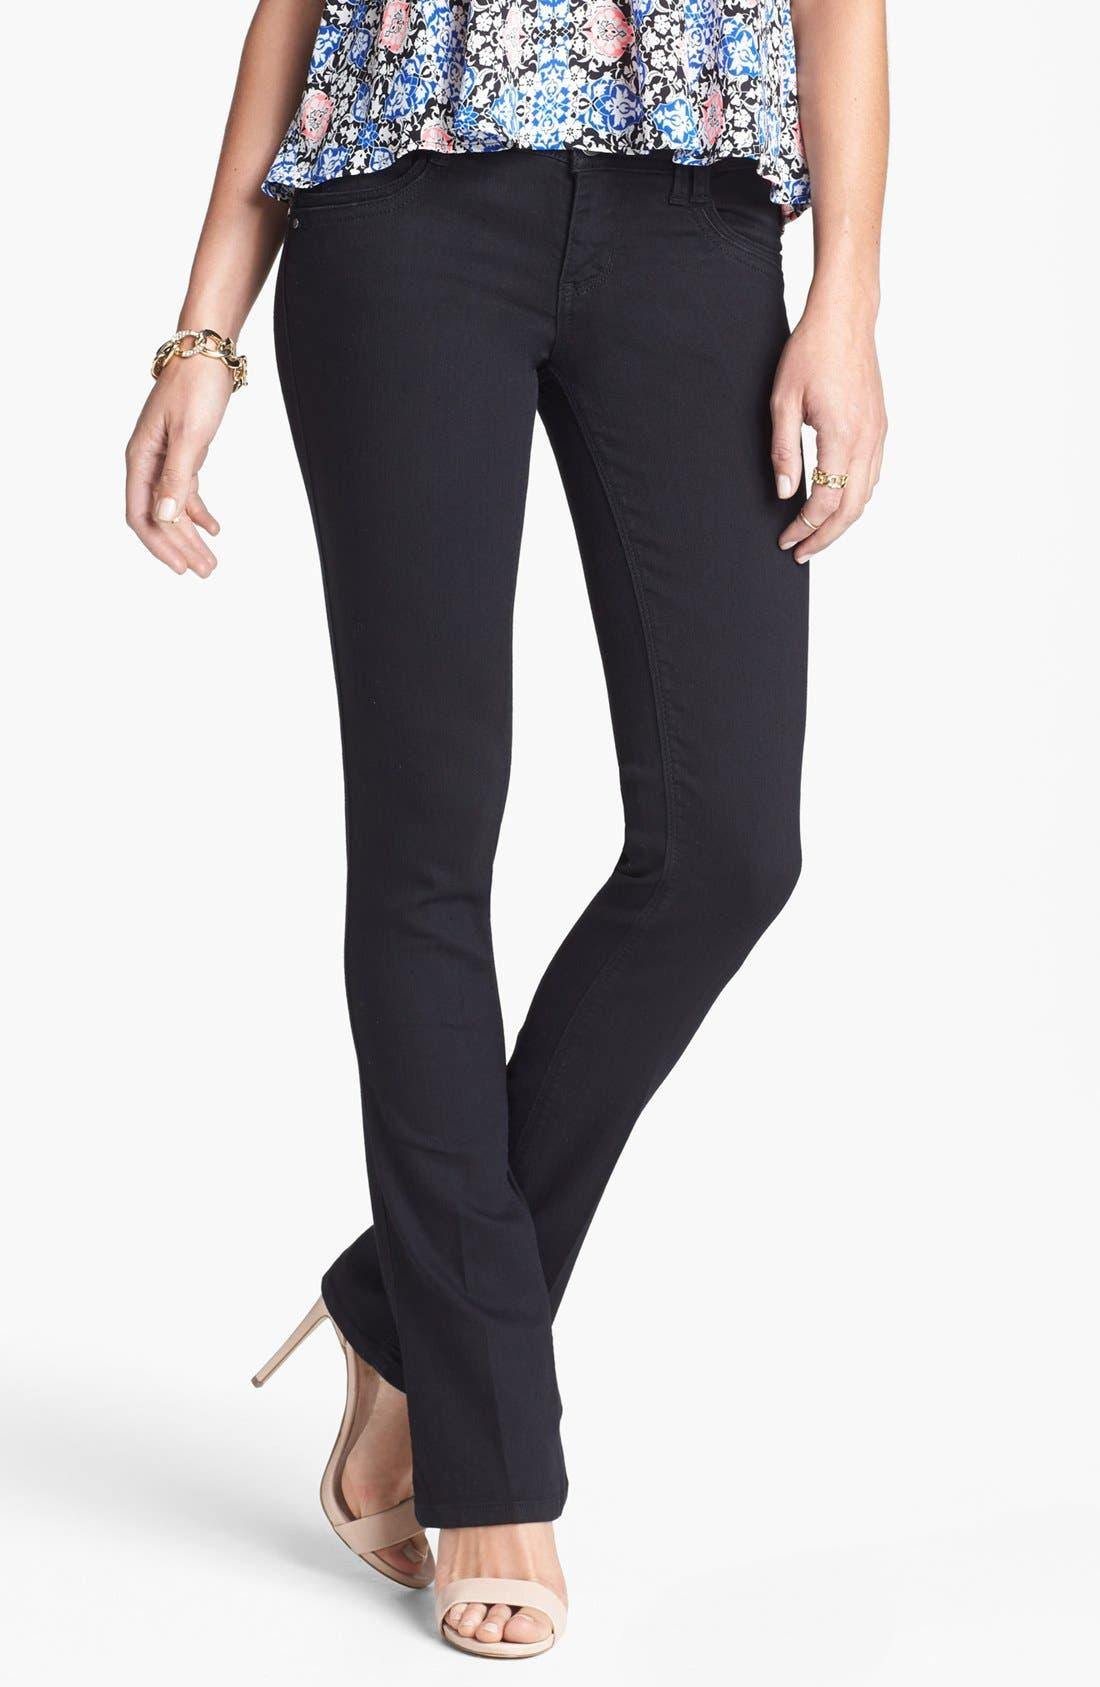 Main Image - Jolt Stretch Bootcut Jeans (Black) (Juniors) (Online Only)